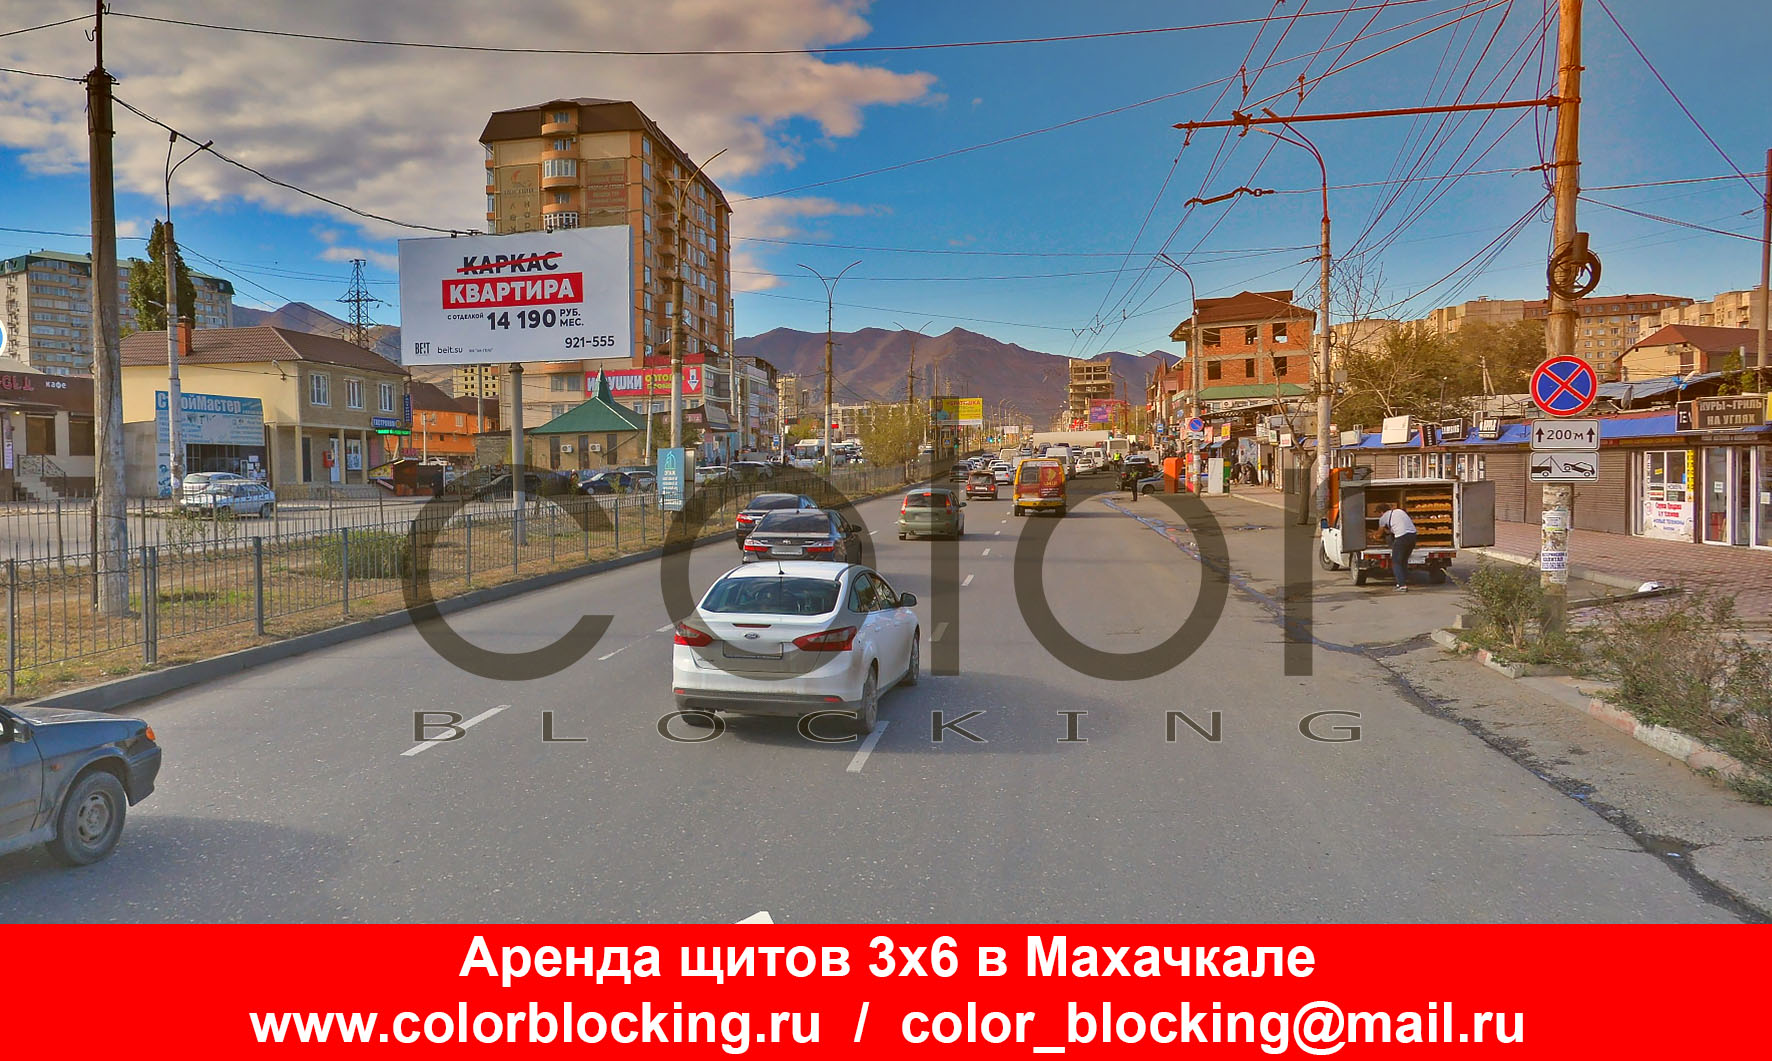 Наружная реклама в Махачкале Акушинского